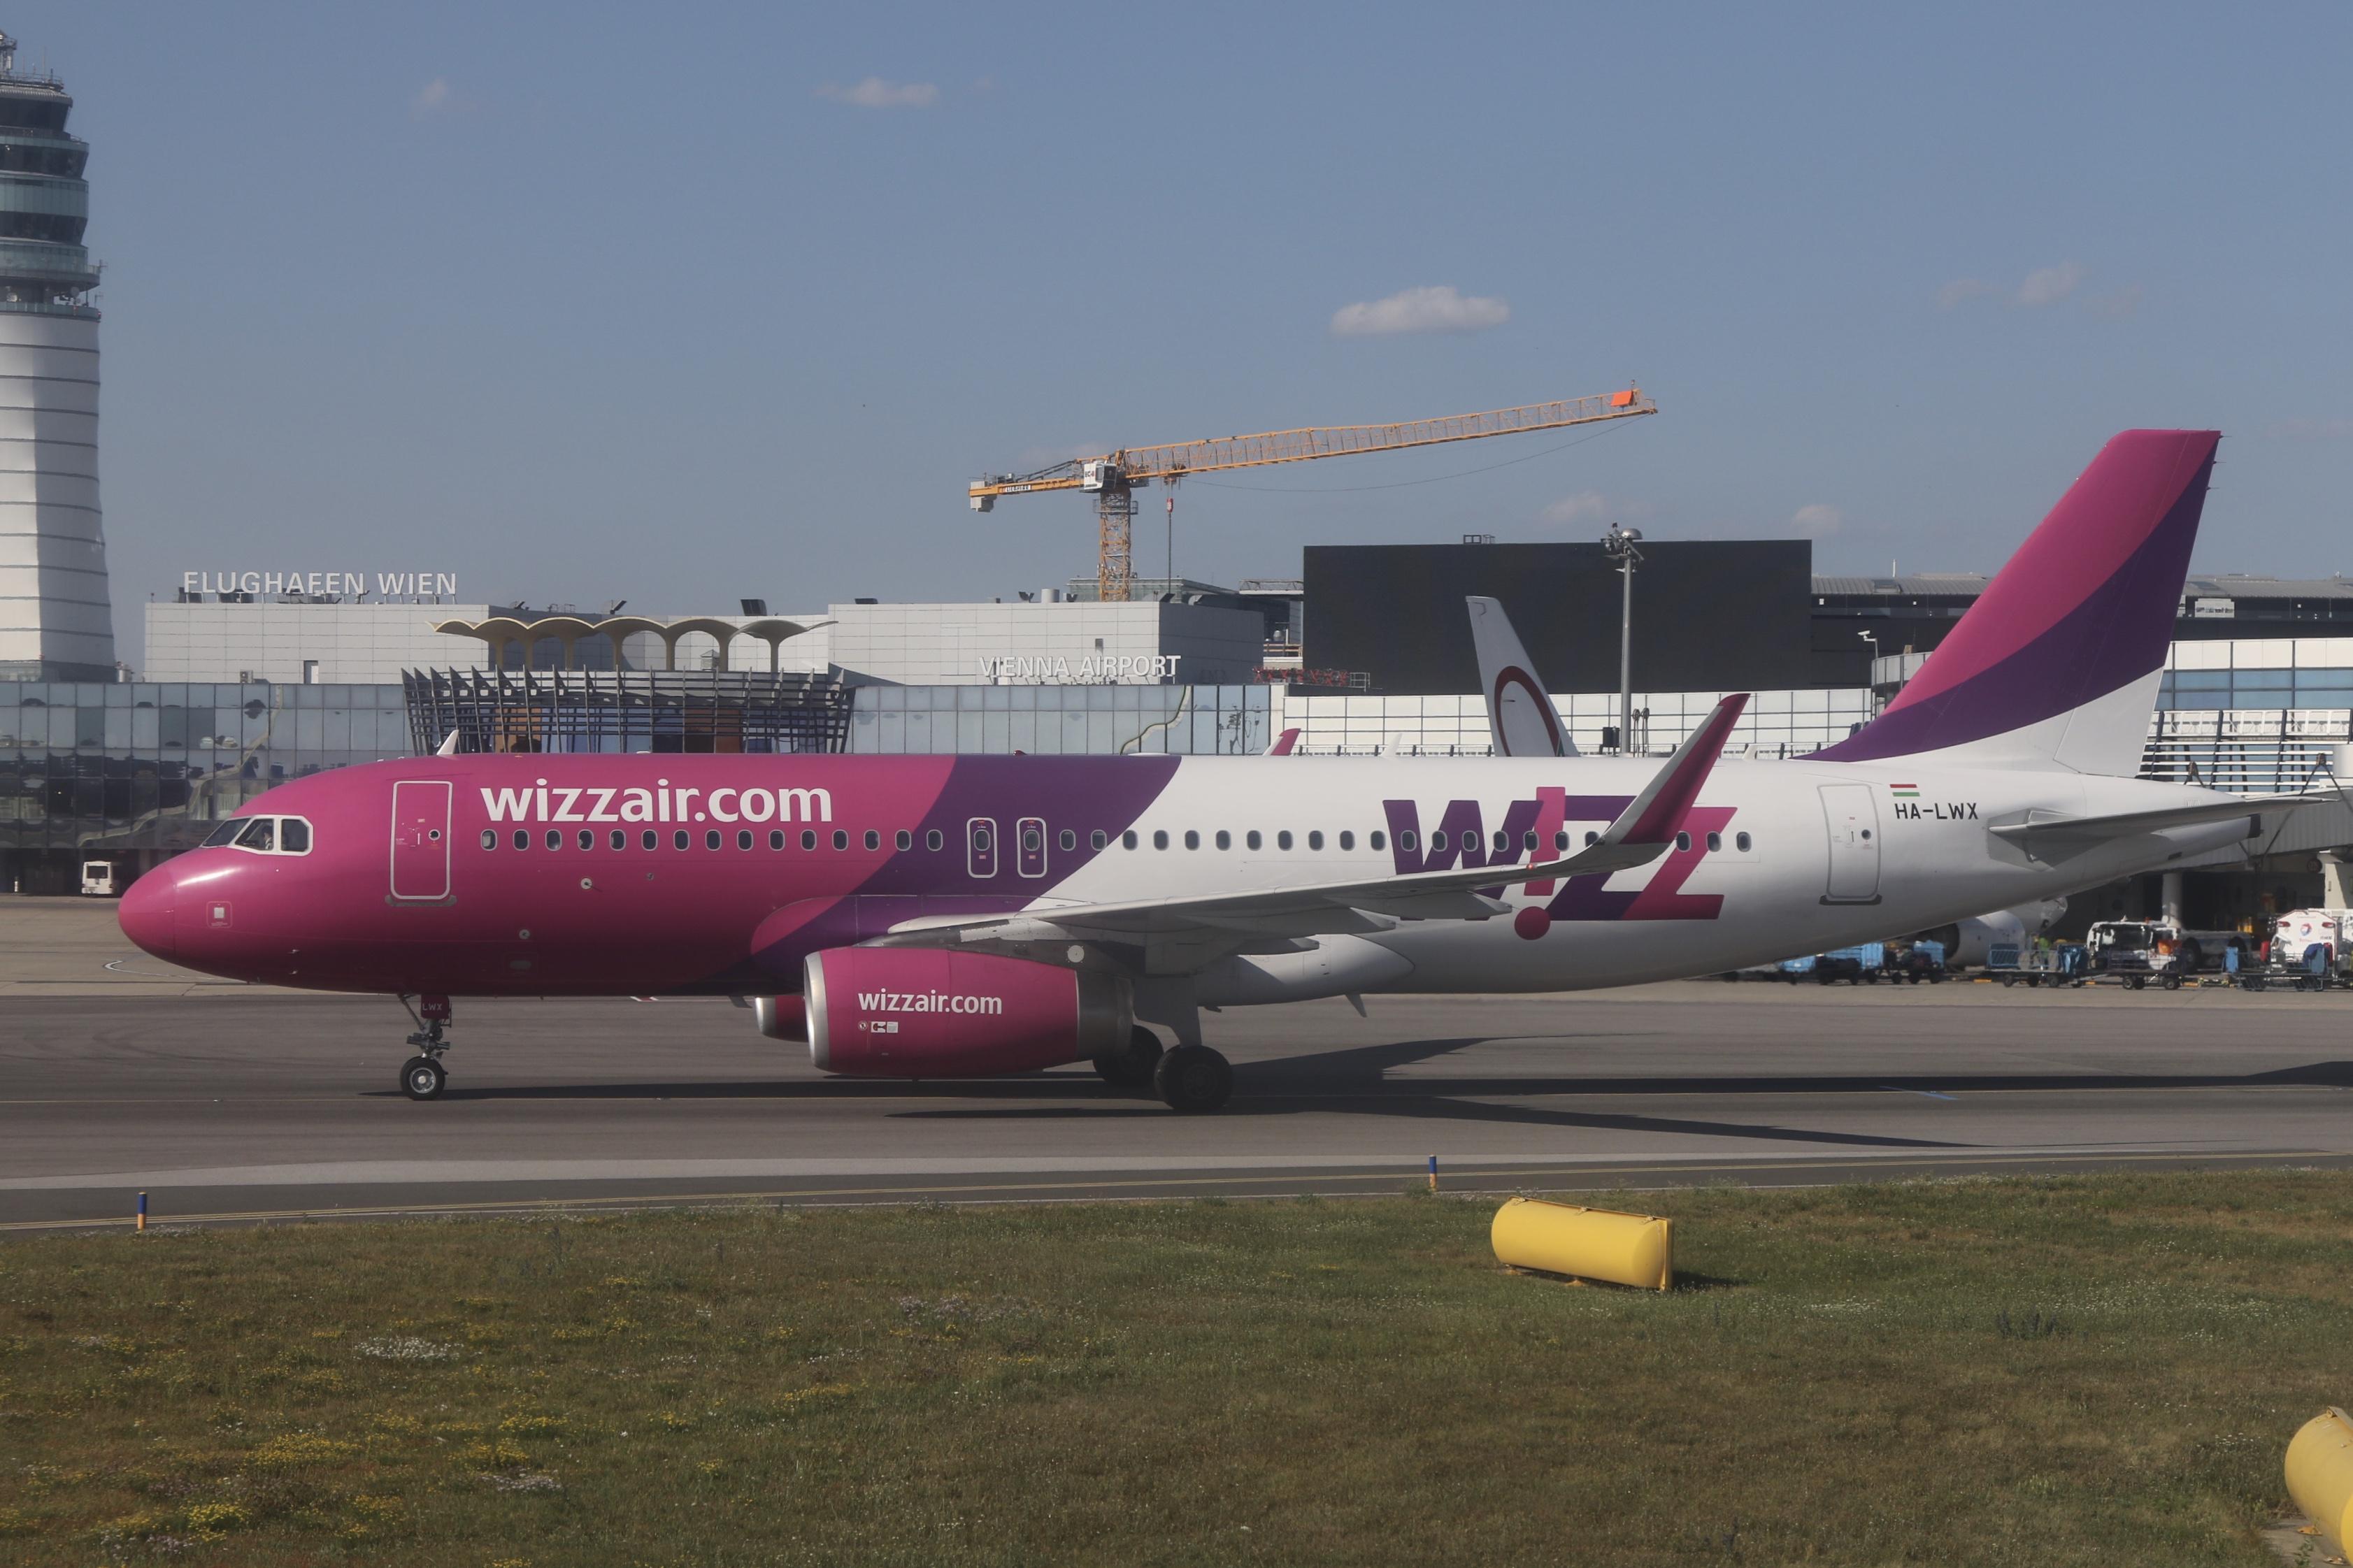 File Wizz Air Ha Lwx At Vienna International Airport Jpg Wikimedia Commons